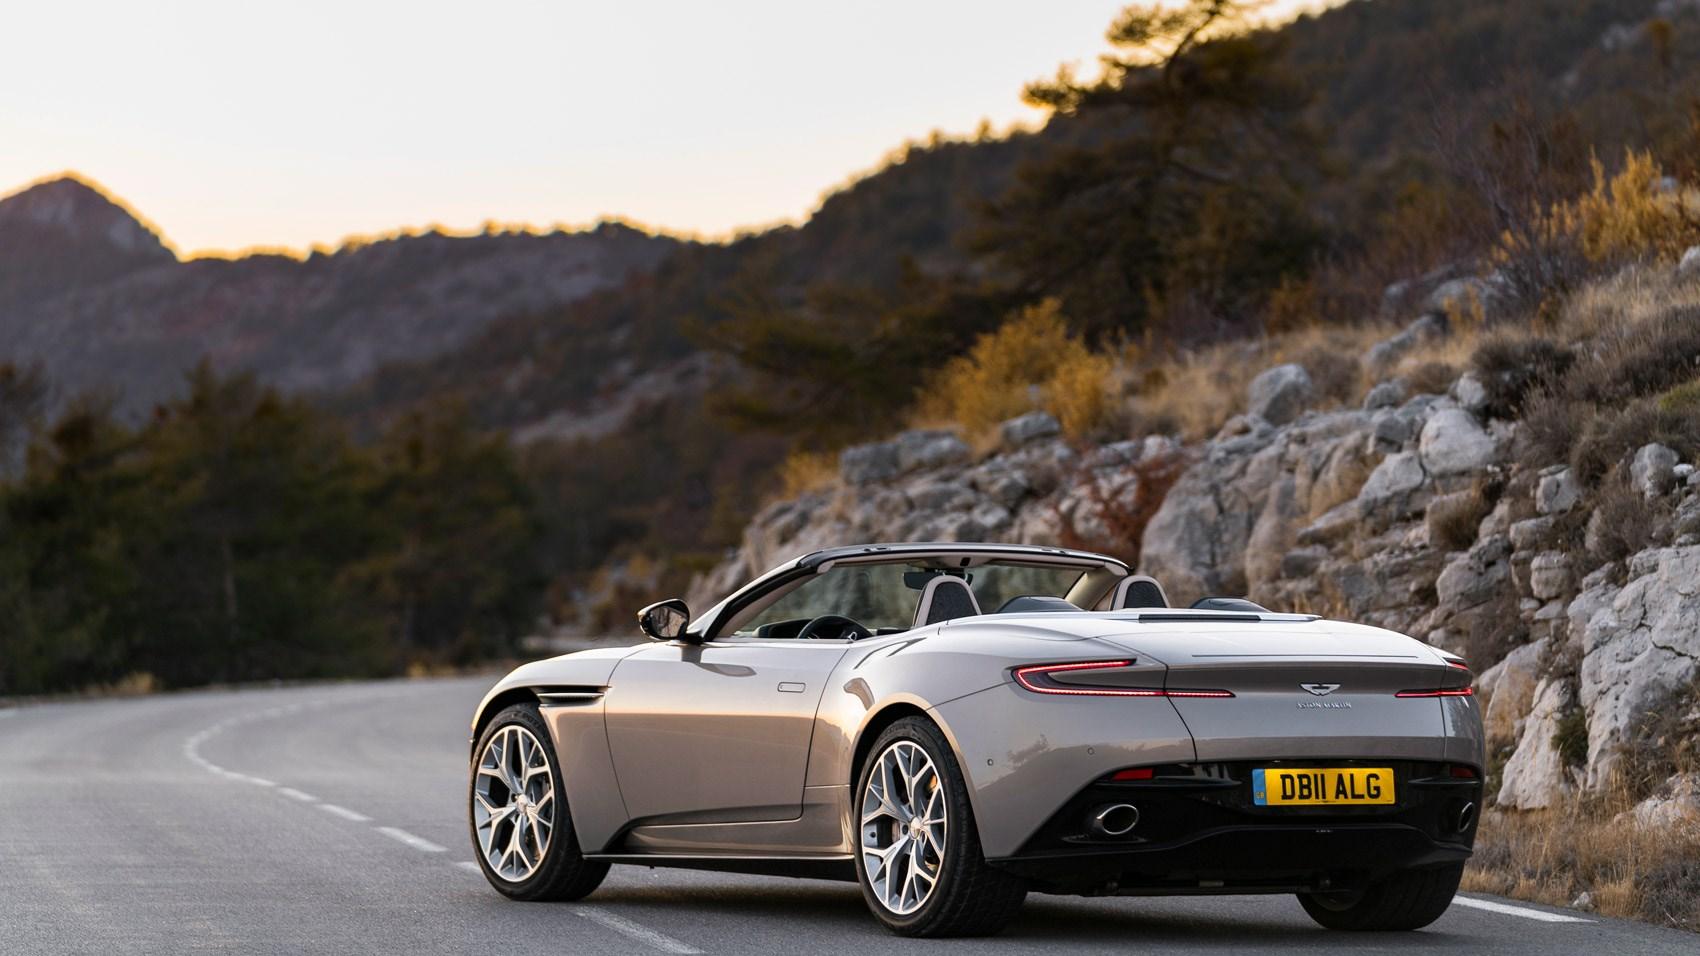 Aston Martin Gt8 >> Aston Martin DB11 Volante review 2018 | CAR Magazine